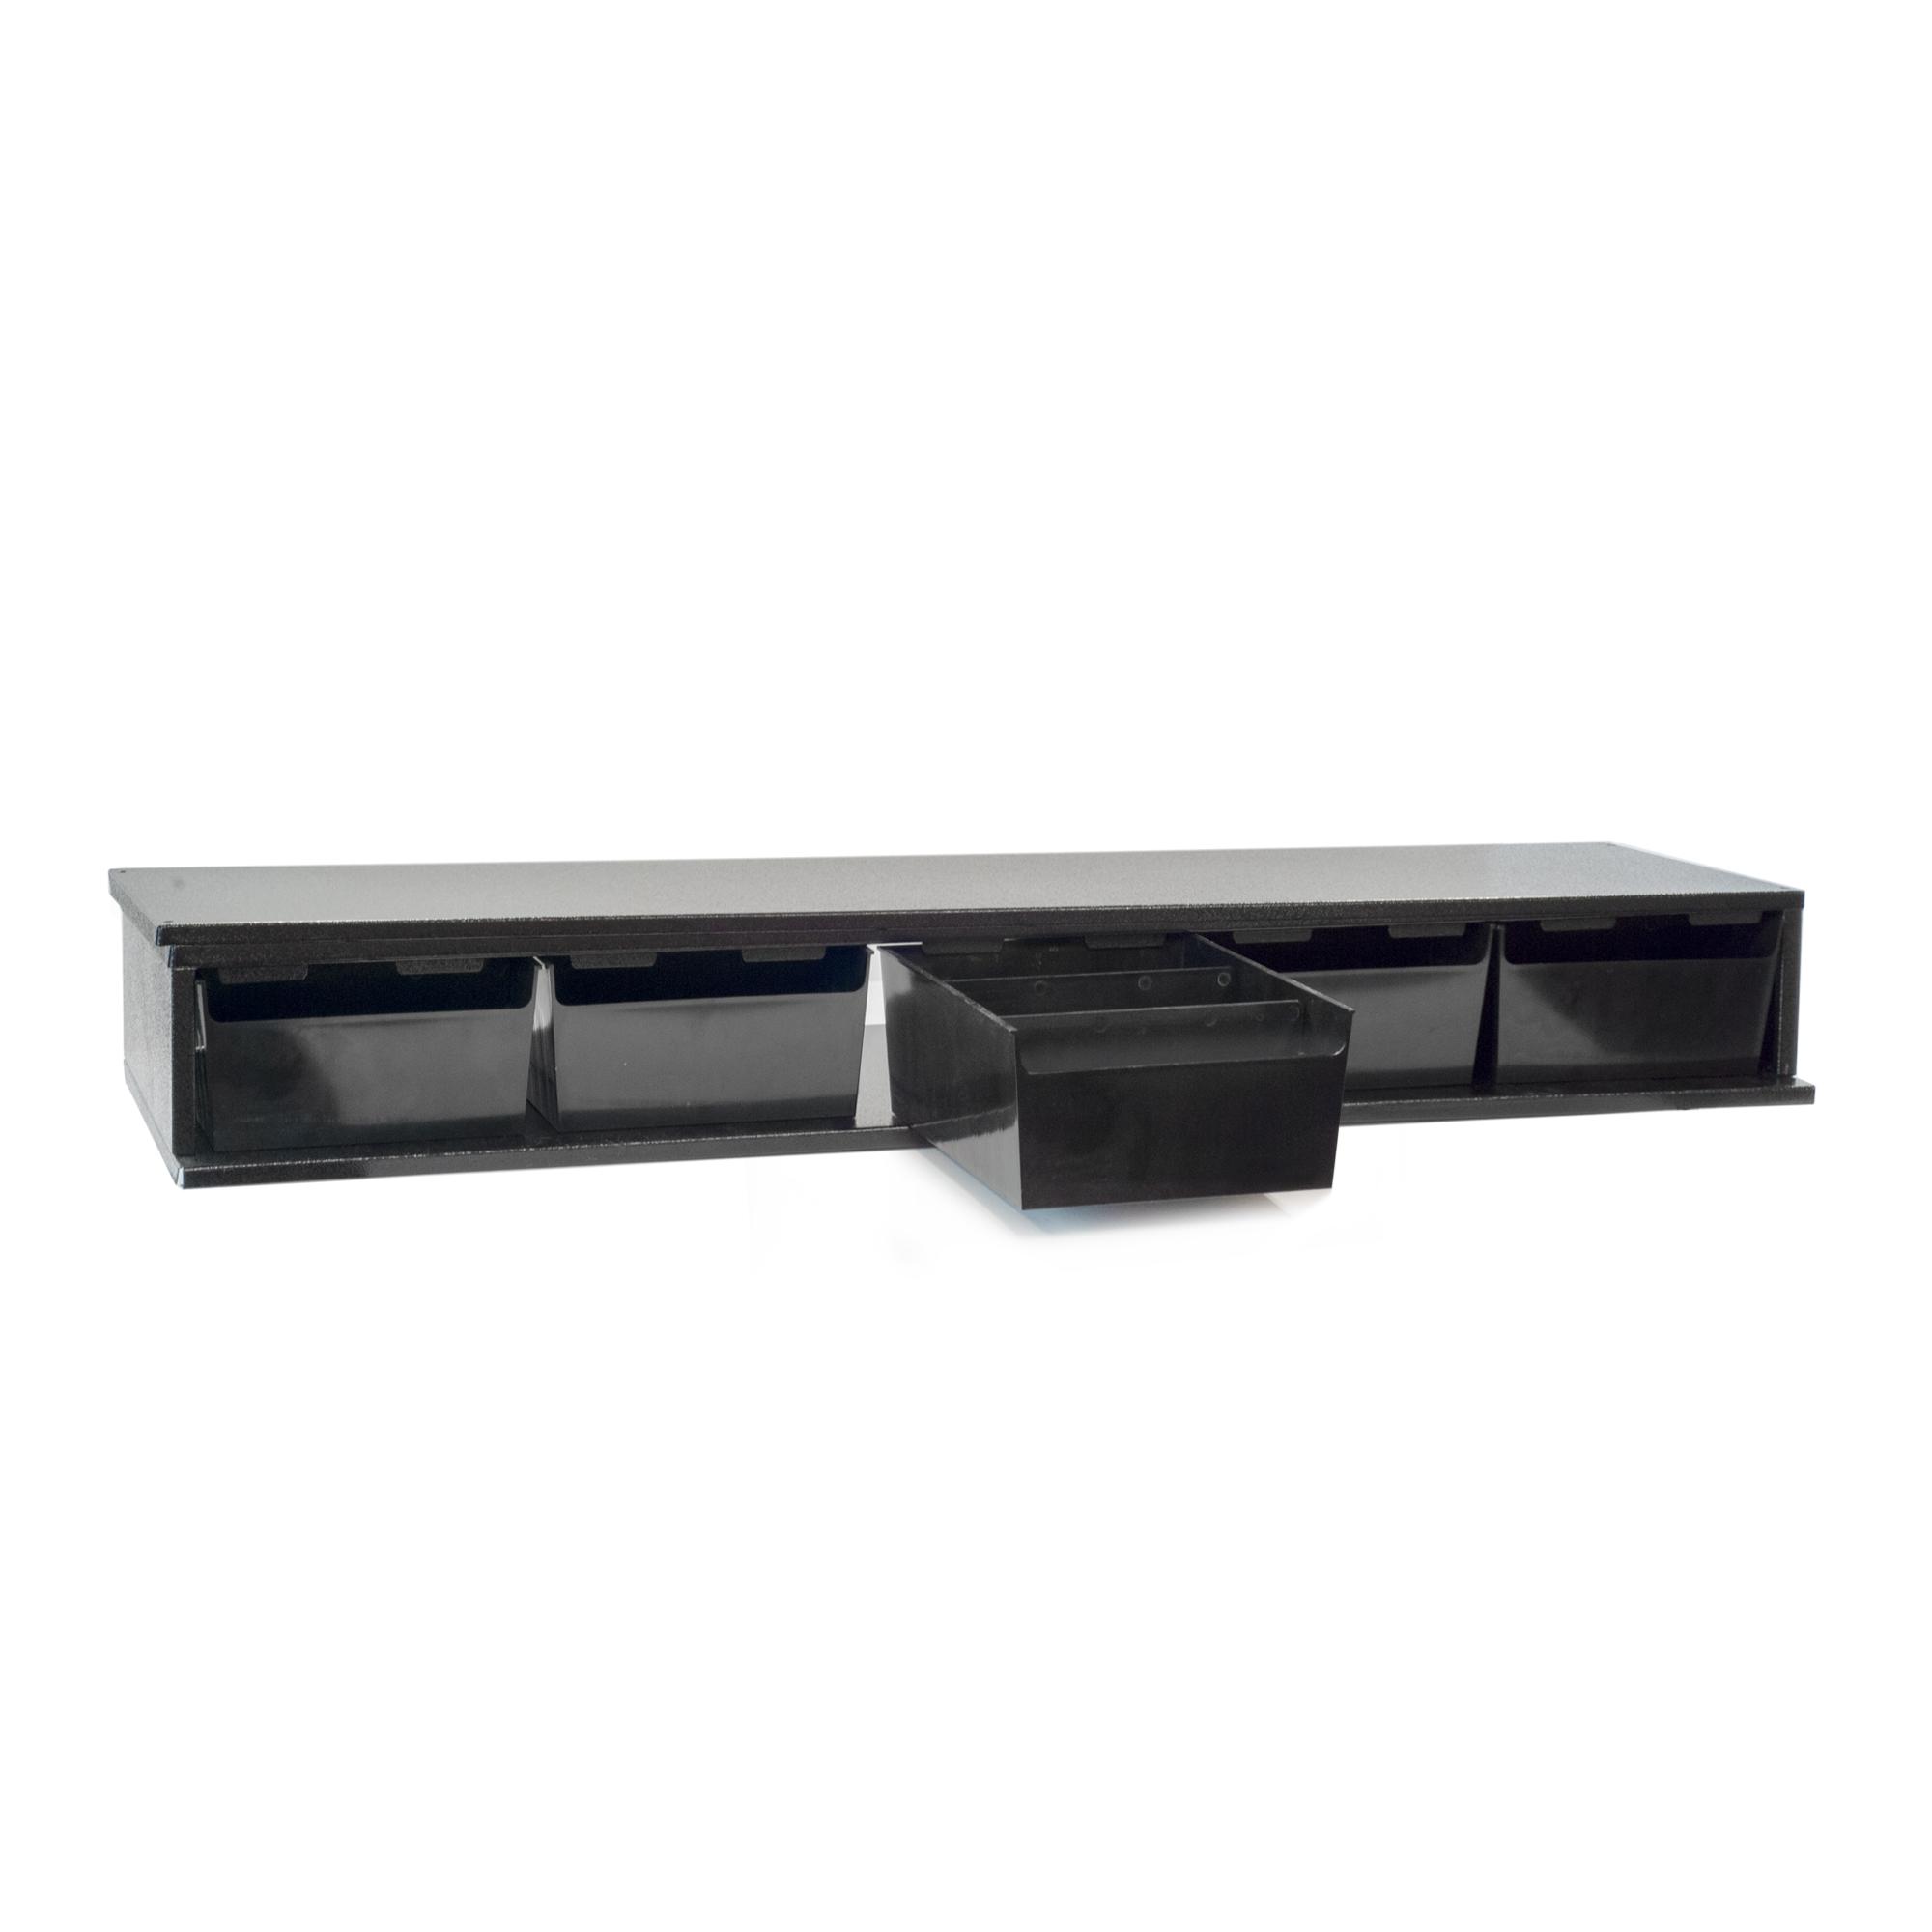 Craftline Storage System | Made In USA | Small Modular Stackable Bin Cabinet | PL-SM5BIN